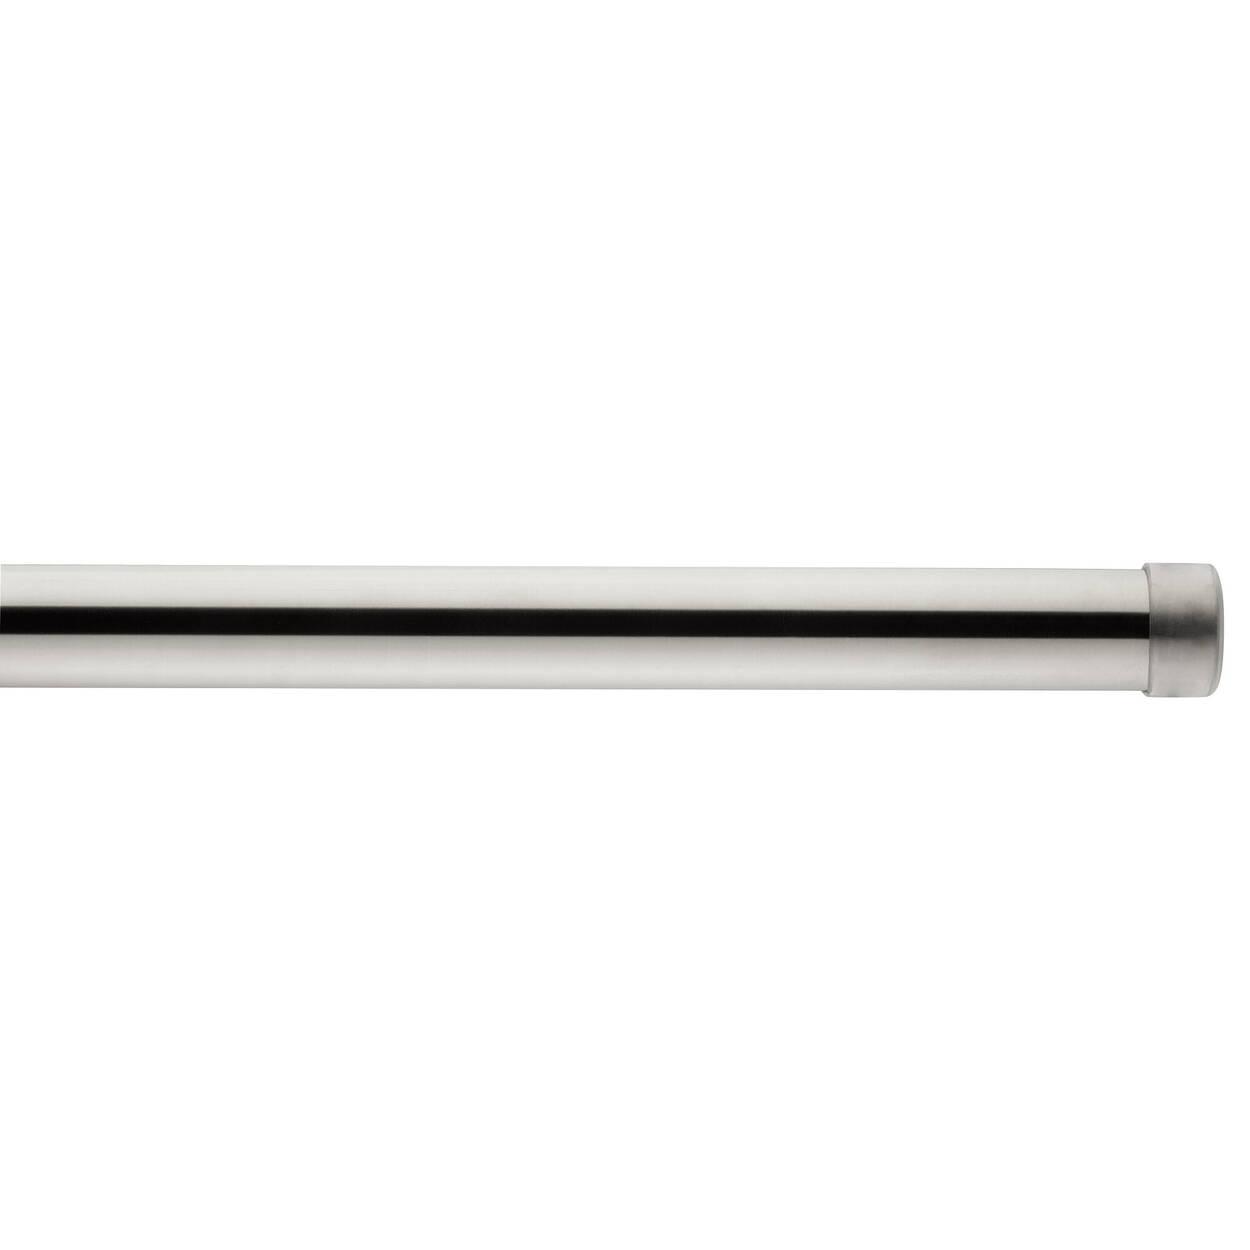 Extension Rod Set - Diameter 25 mm